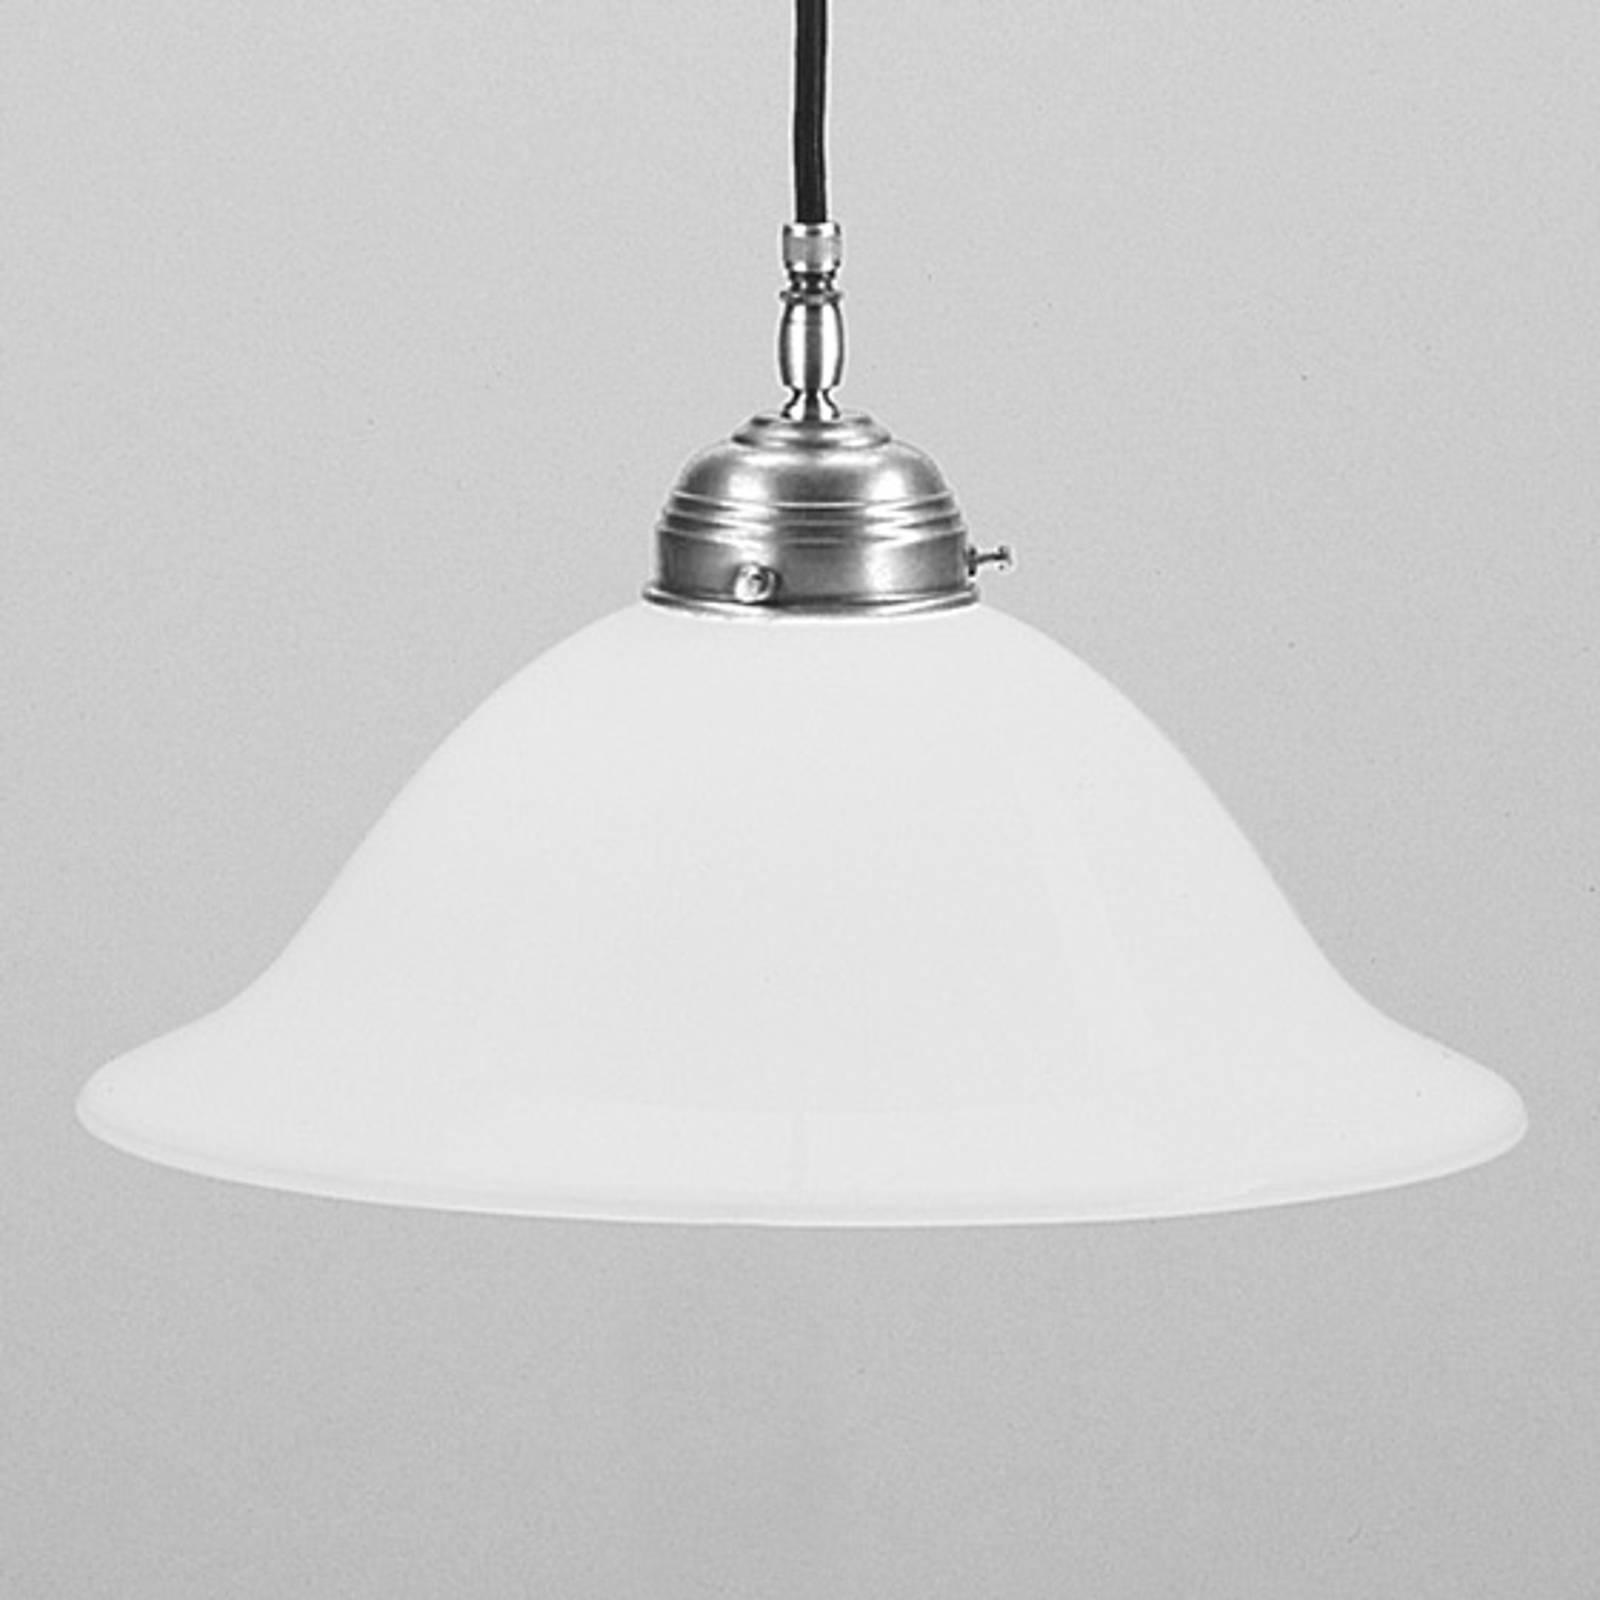 Hanglamp Anja mat nikkel